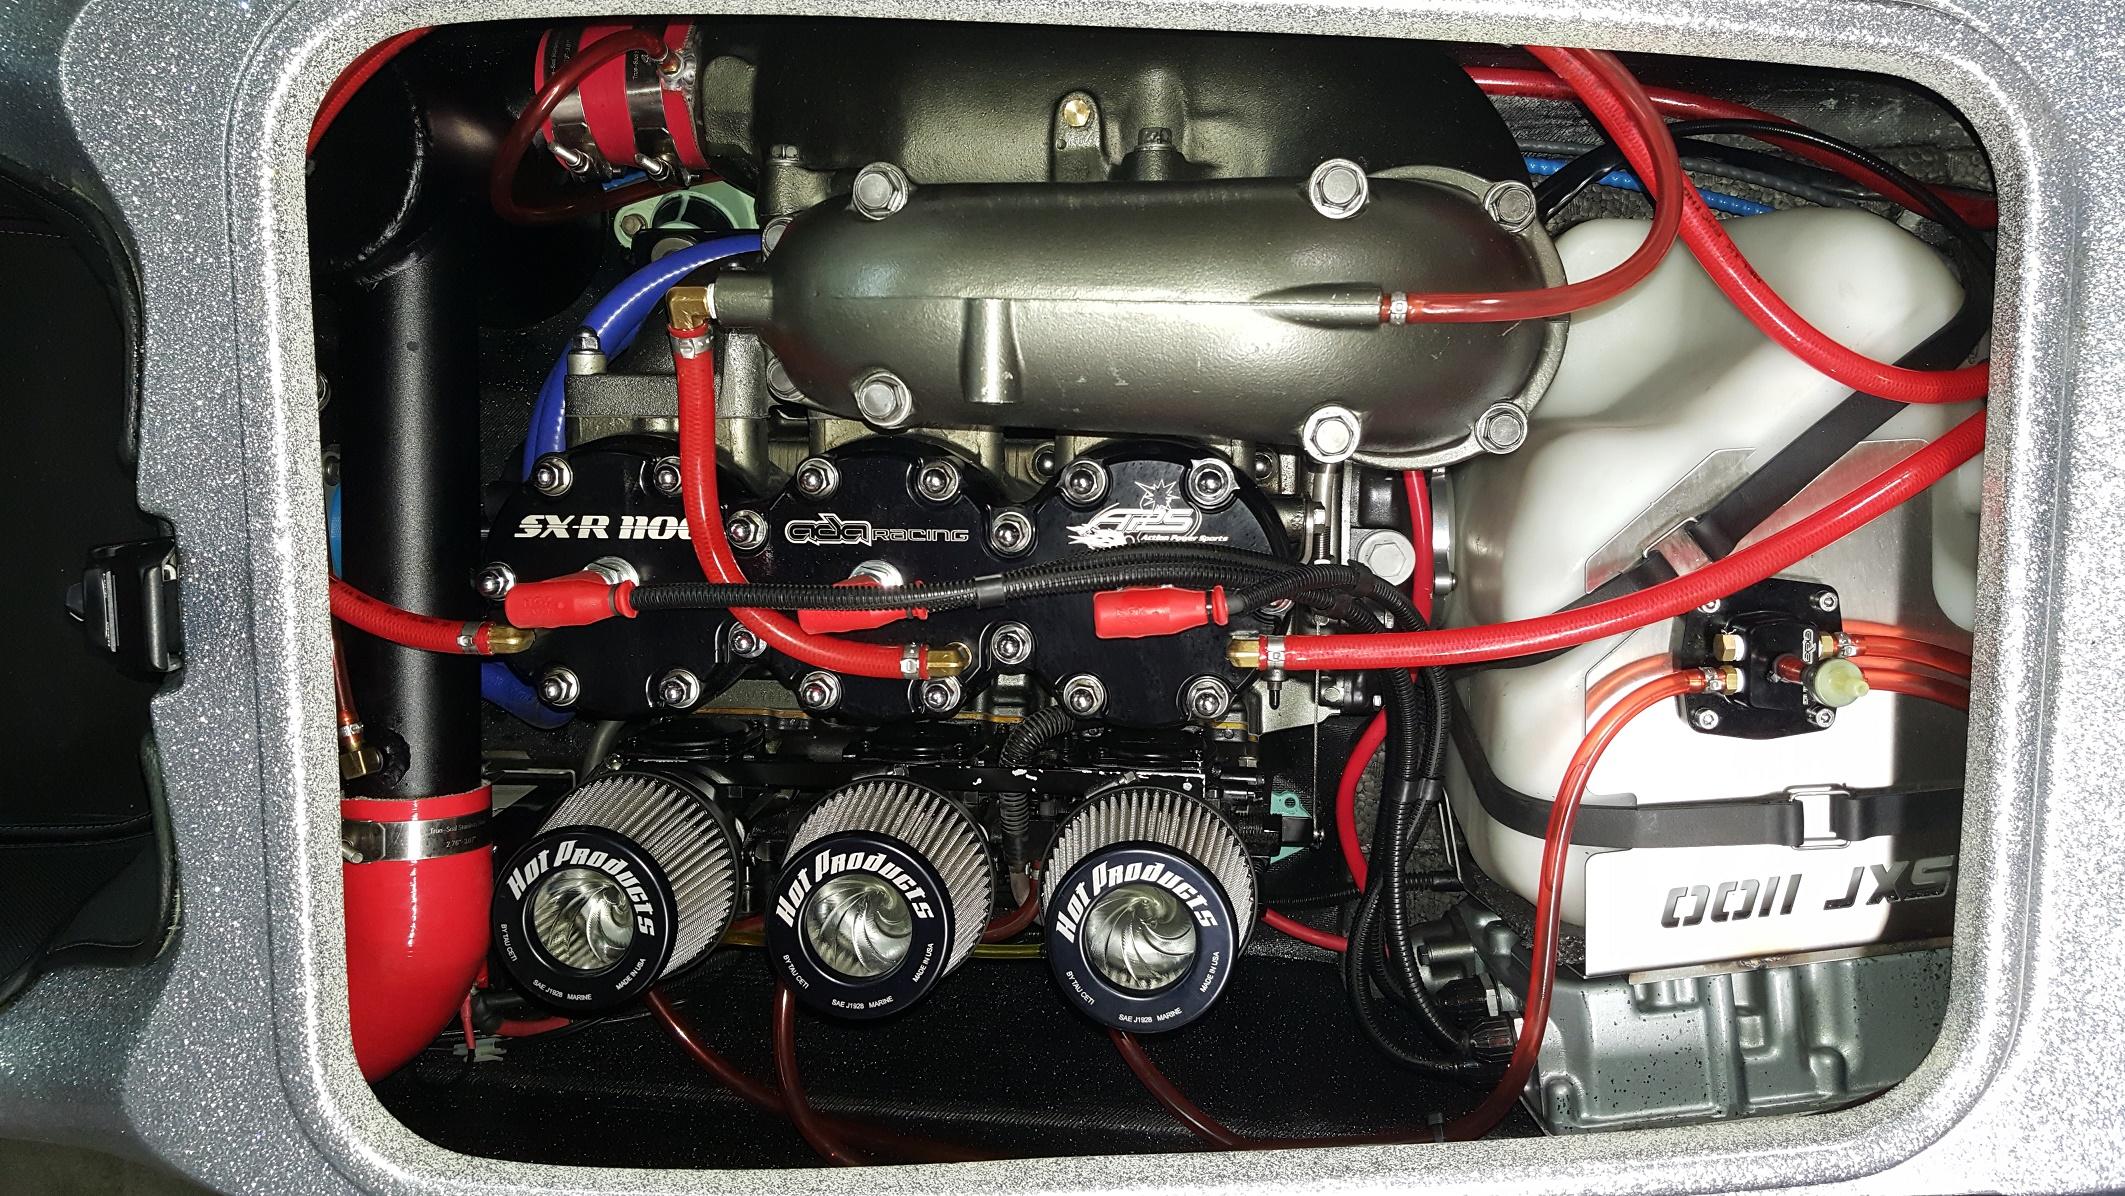 Action Power Sports Arizonas 1 Source For Jet Ski Parts Service Sea Doo Fuel Filter 20160923 131623 1288109 Orig